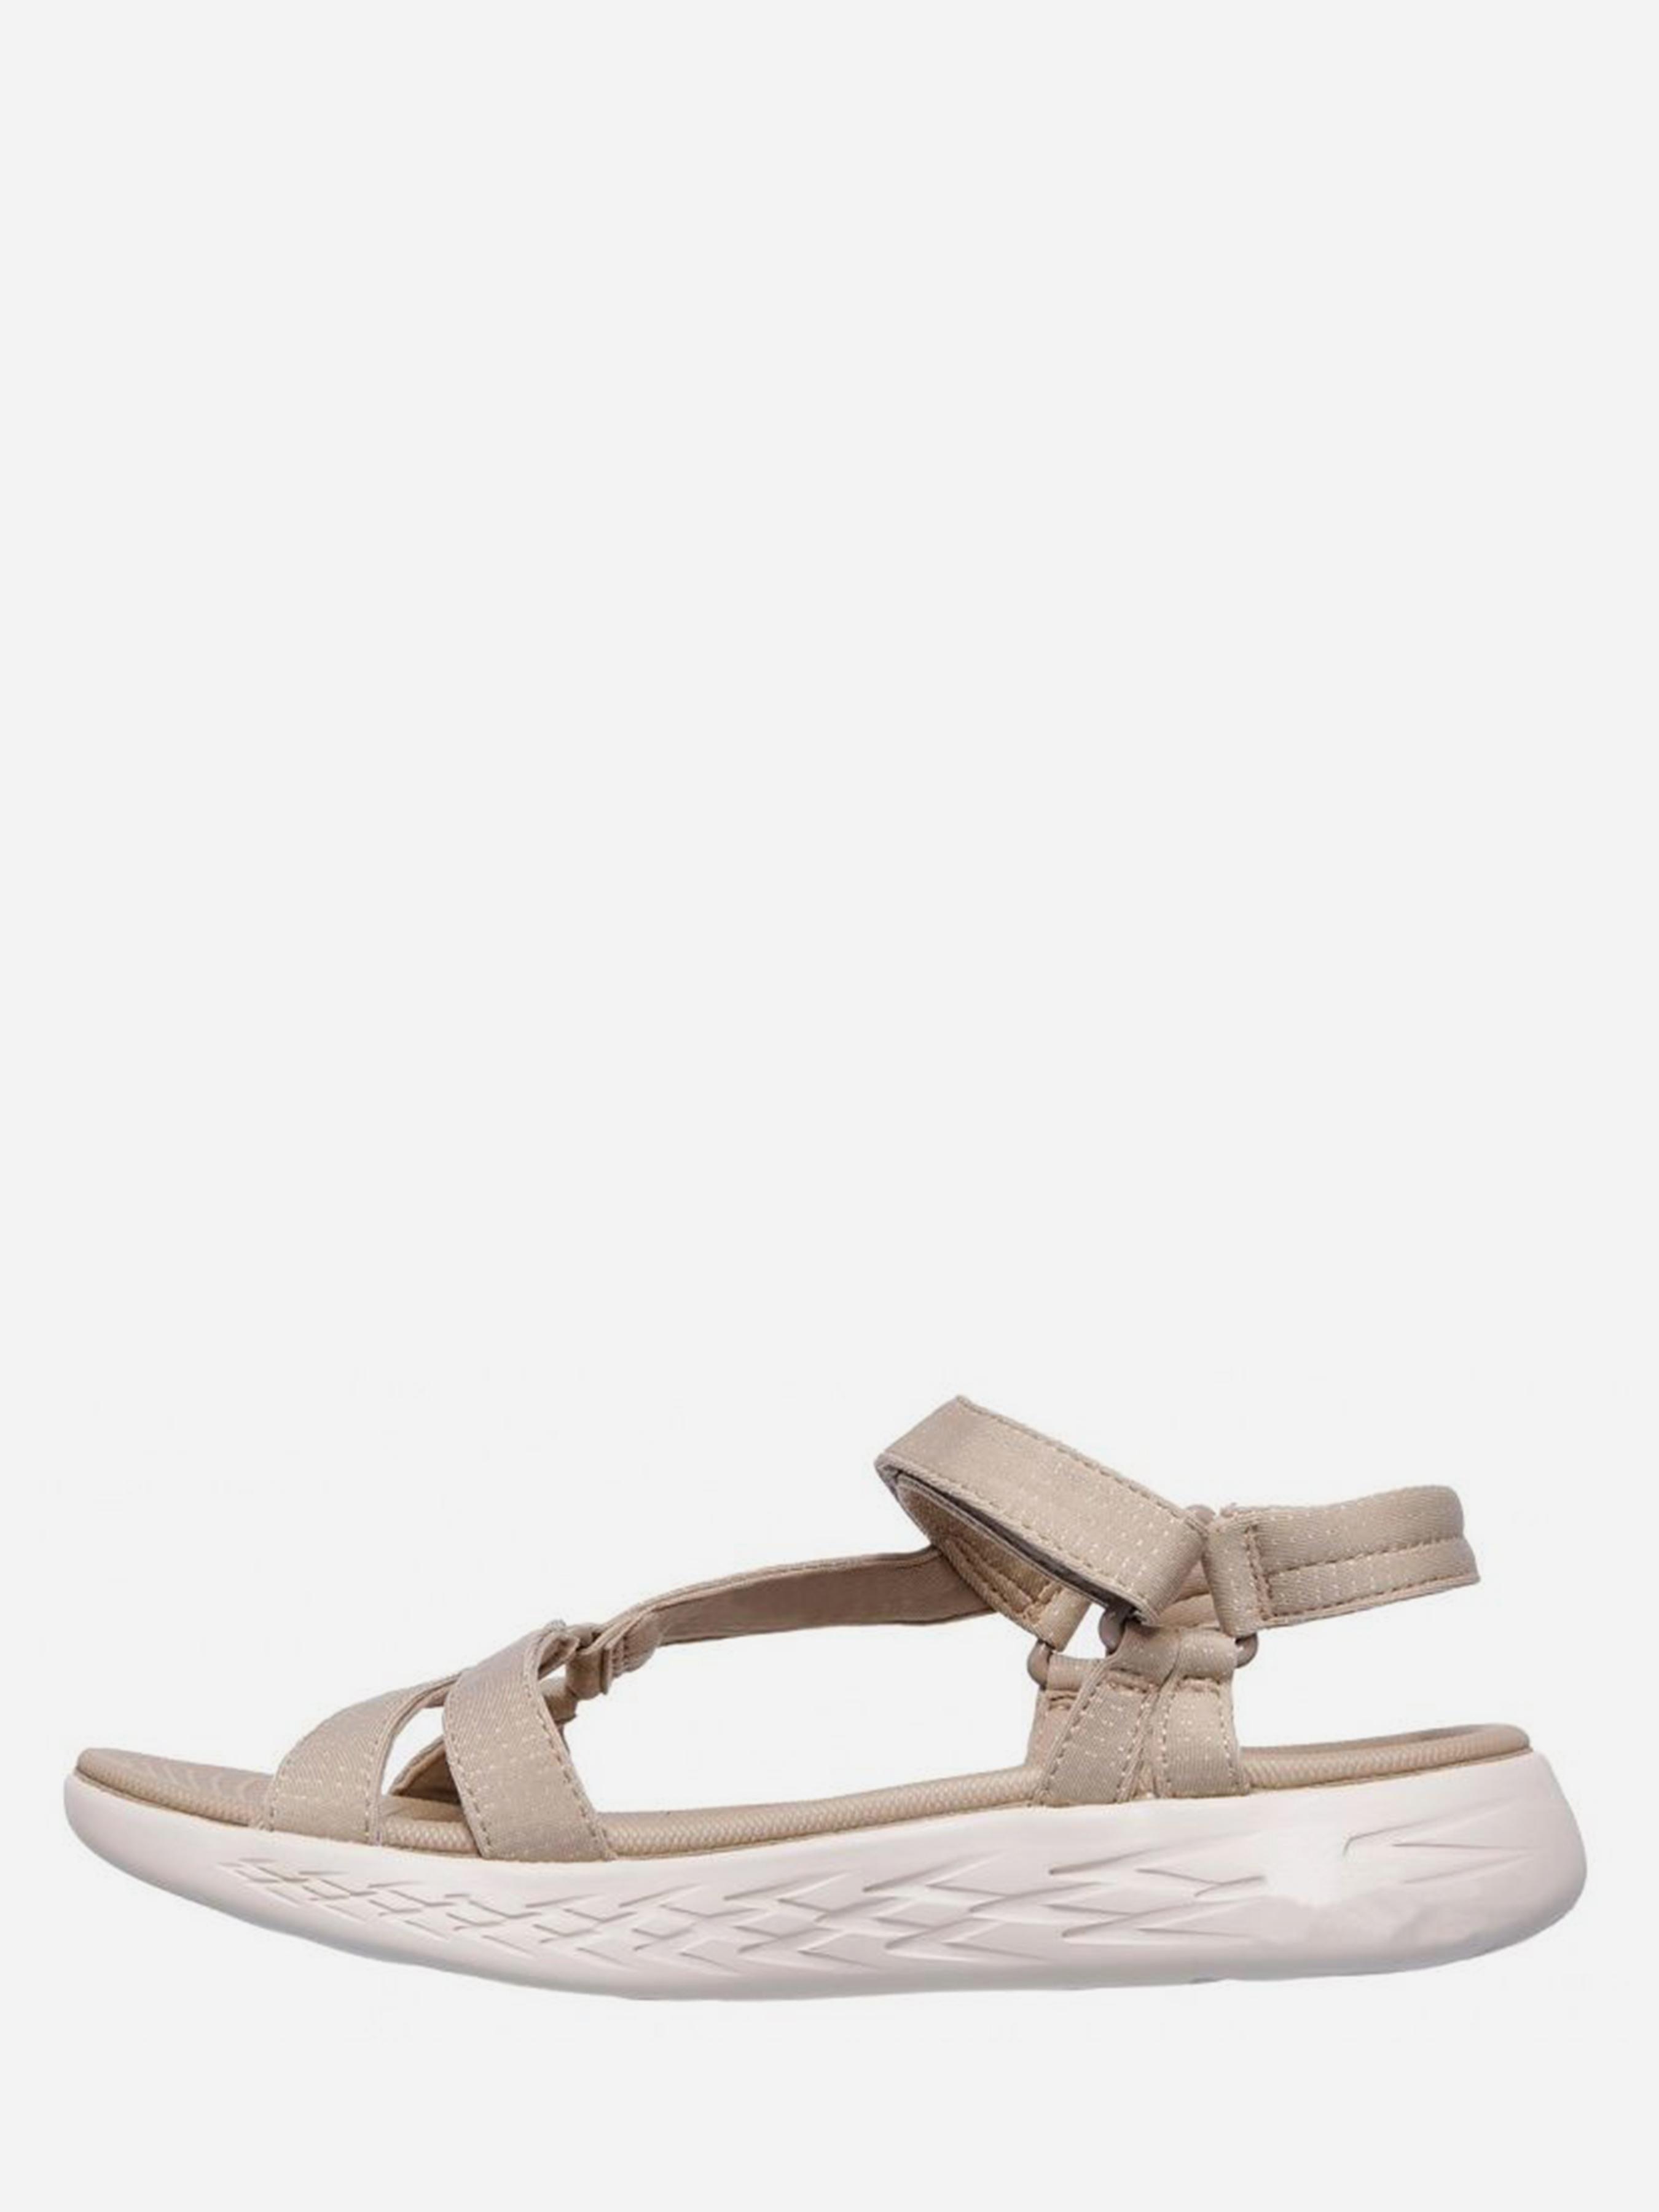 Сандалі  для жінок Skechers 15316 NAT модне взуття, 2017